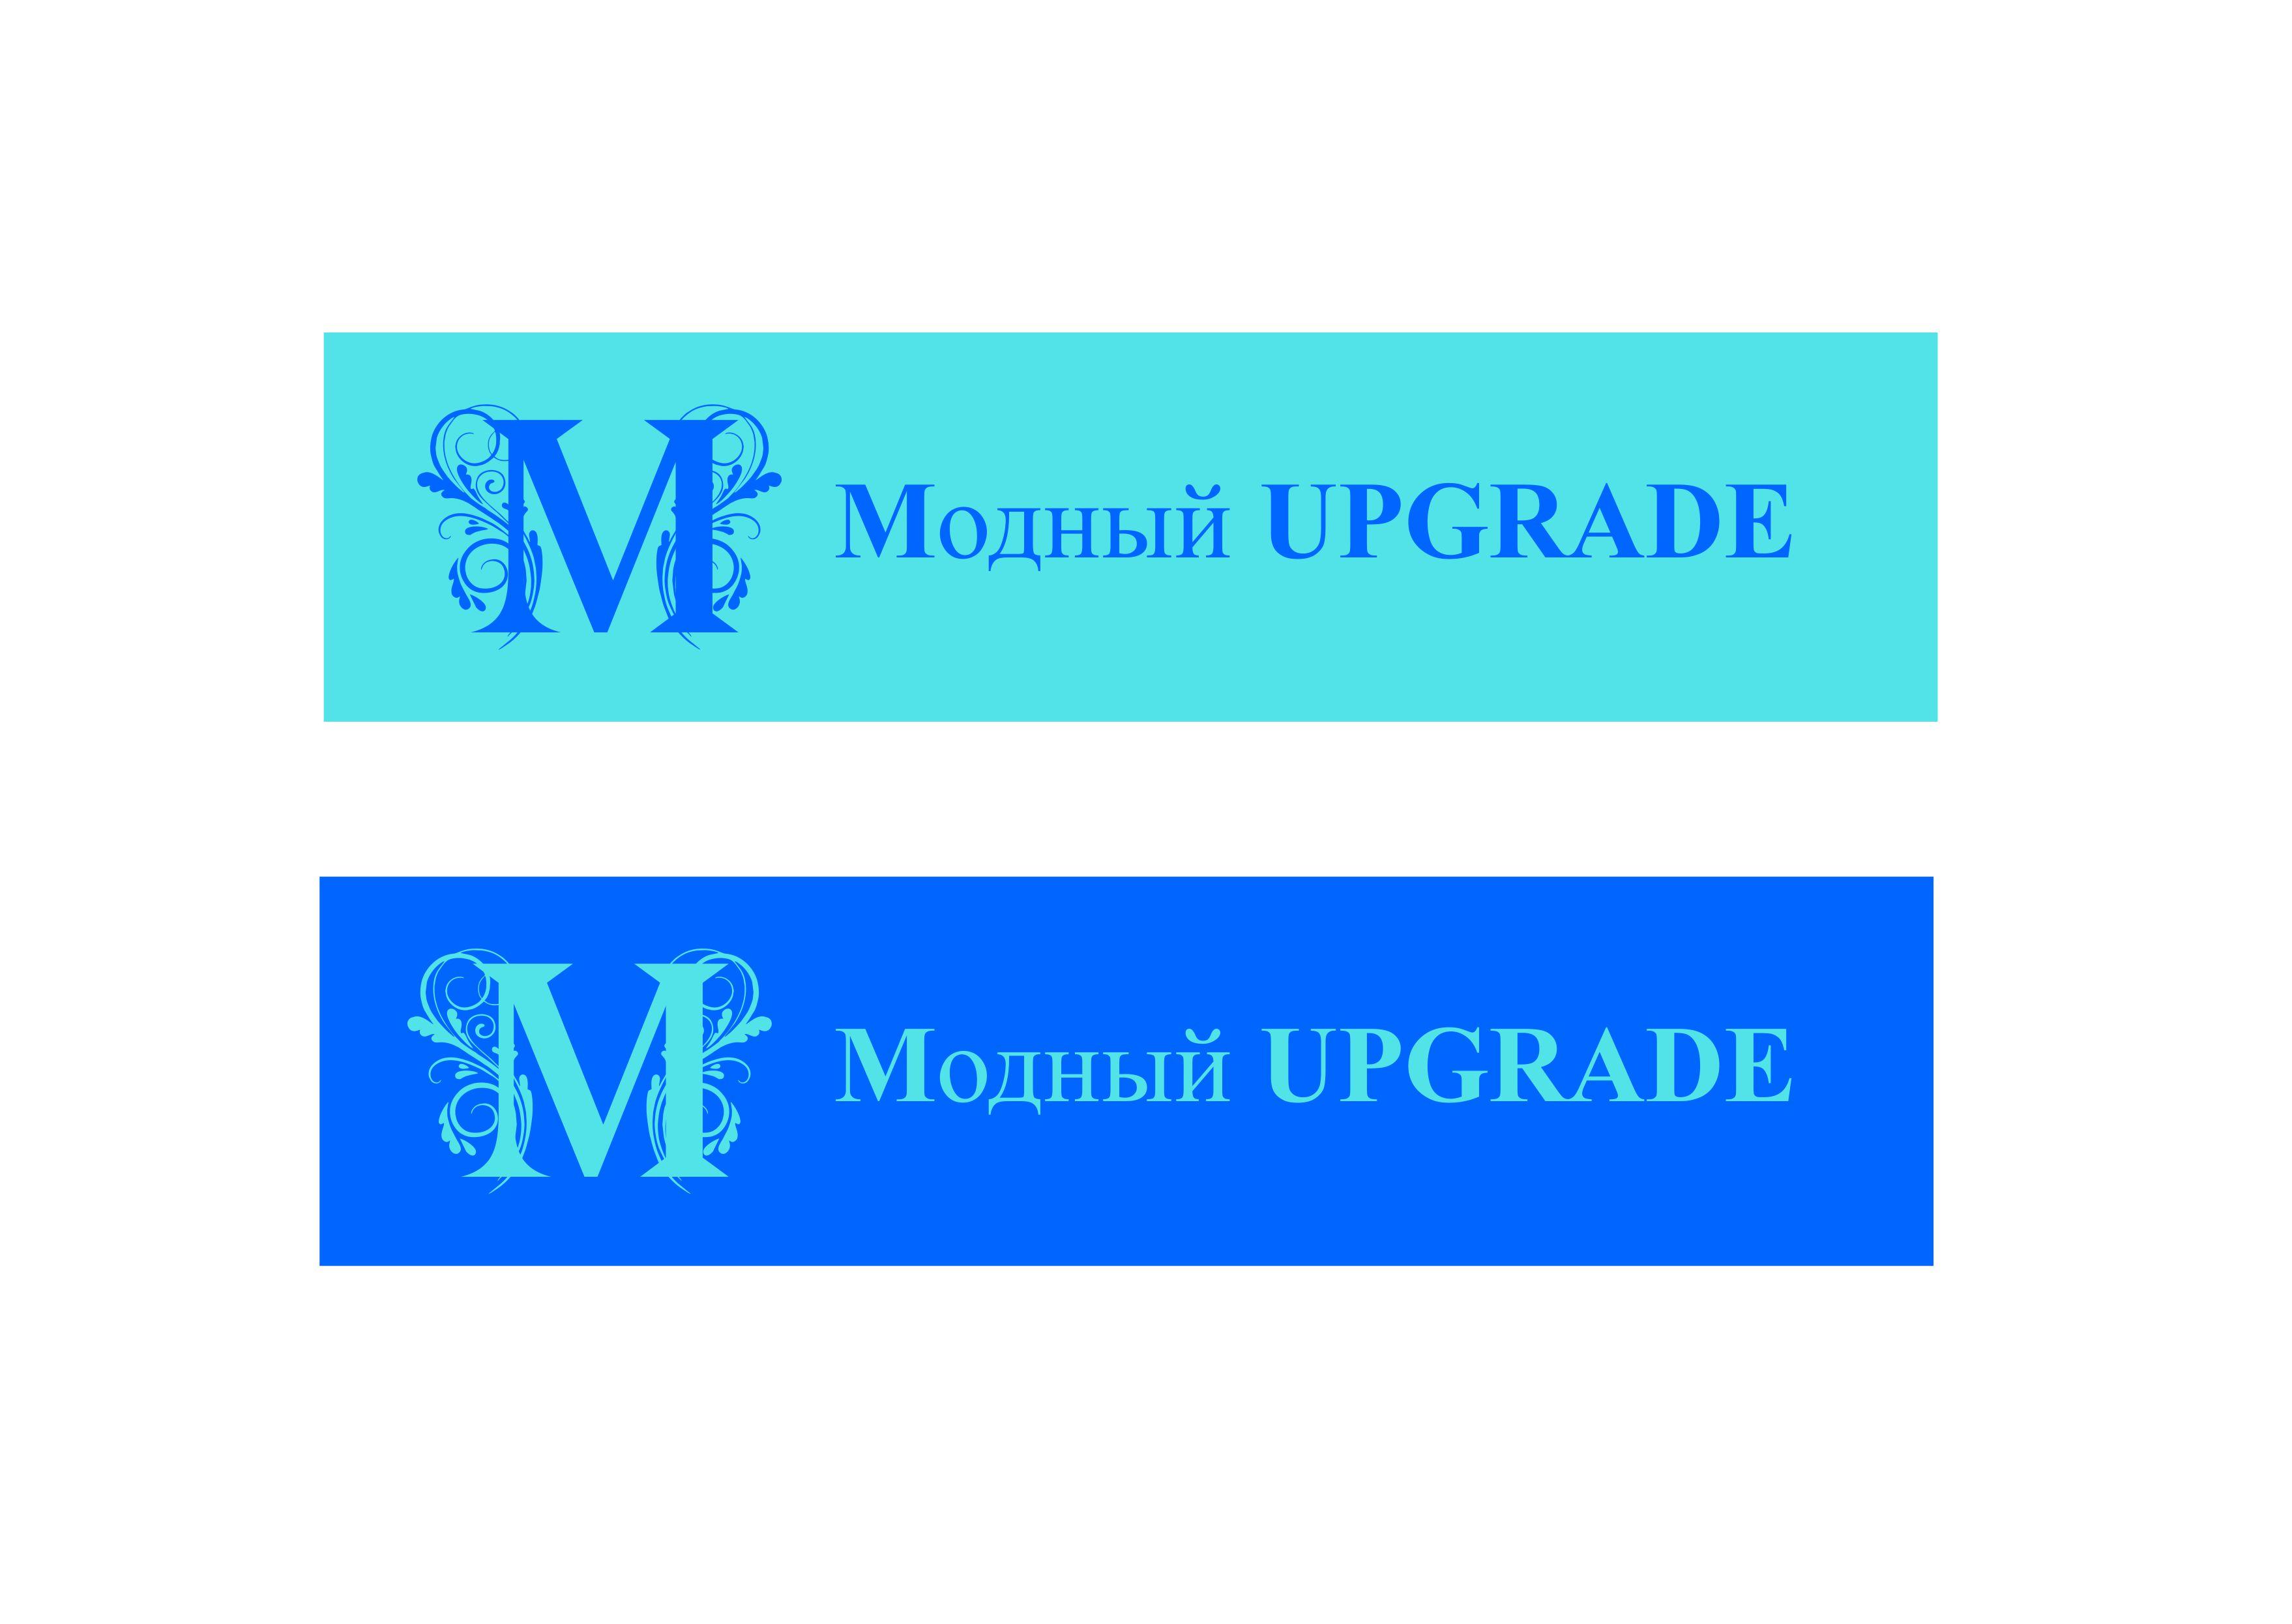 "Логотип интернет магазина ""Модный UPGRADE"" фото f_97759418b3225961.jpg"